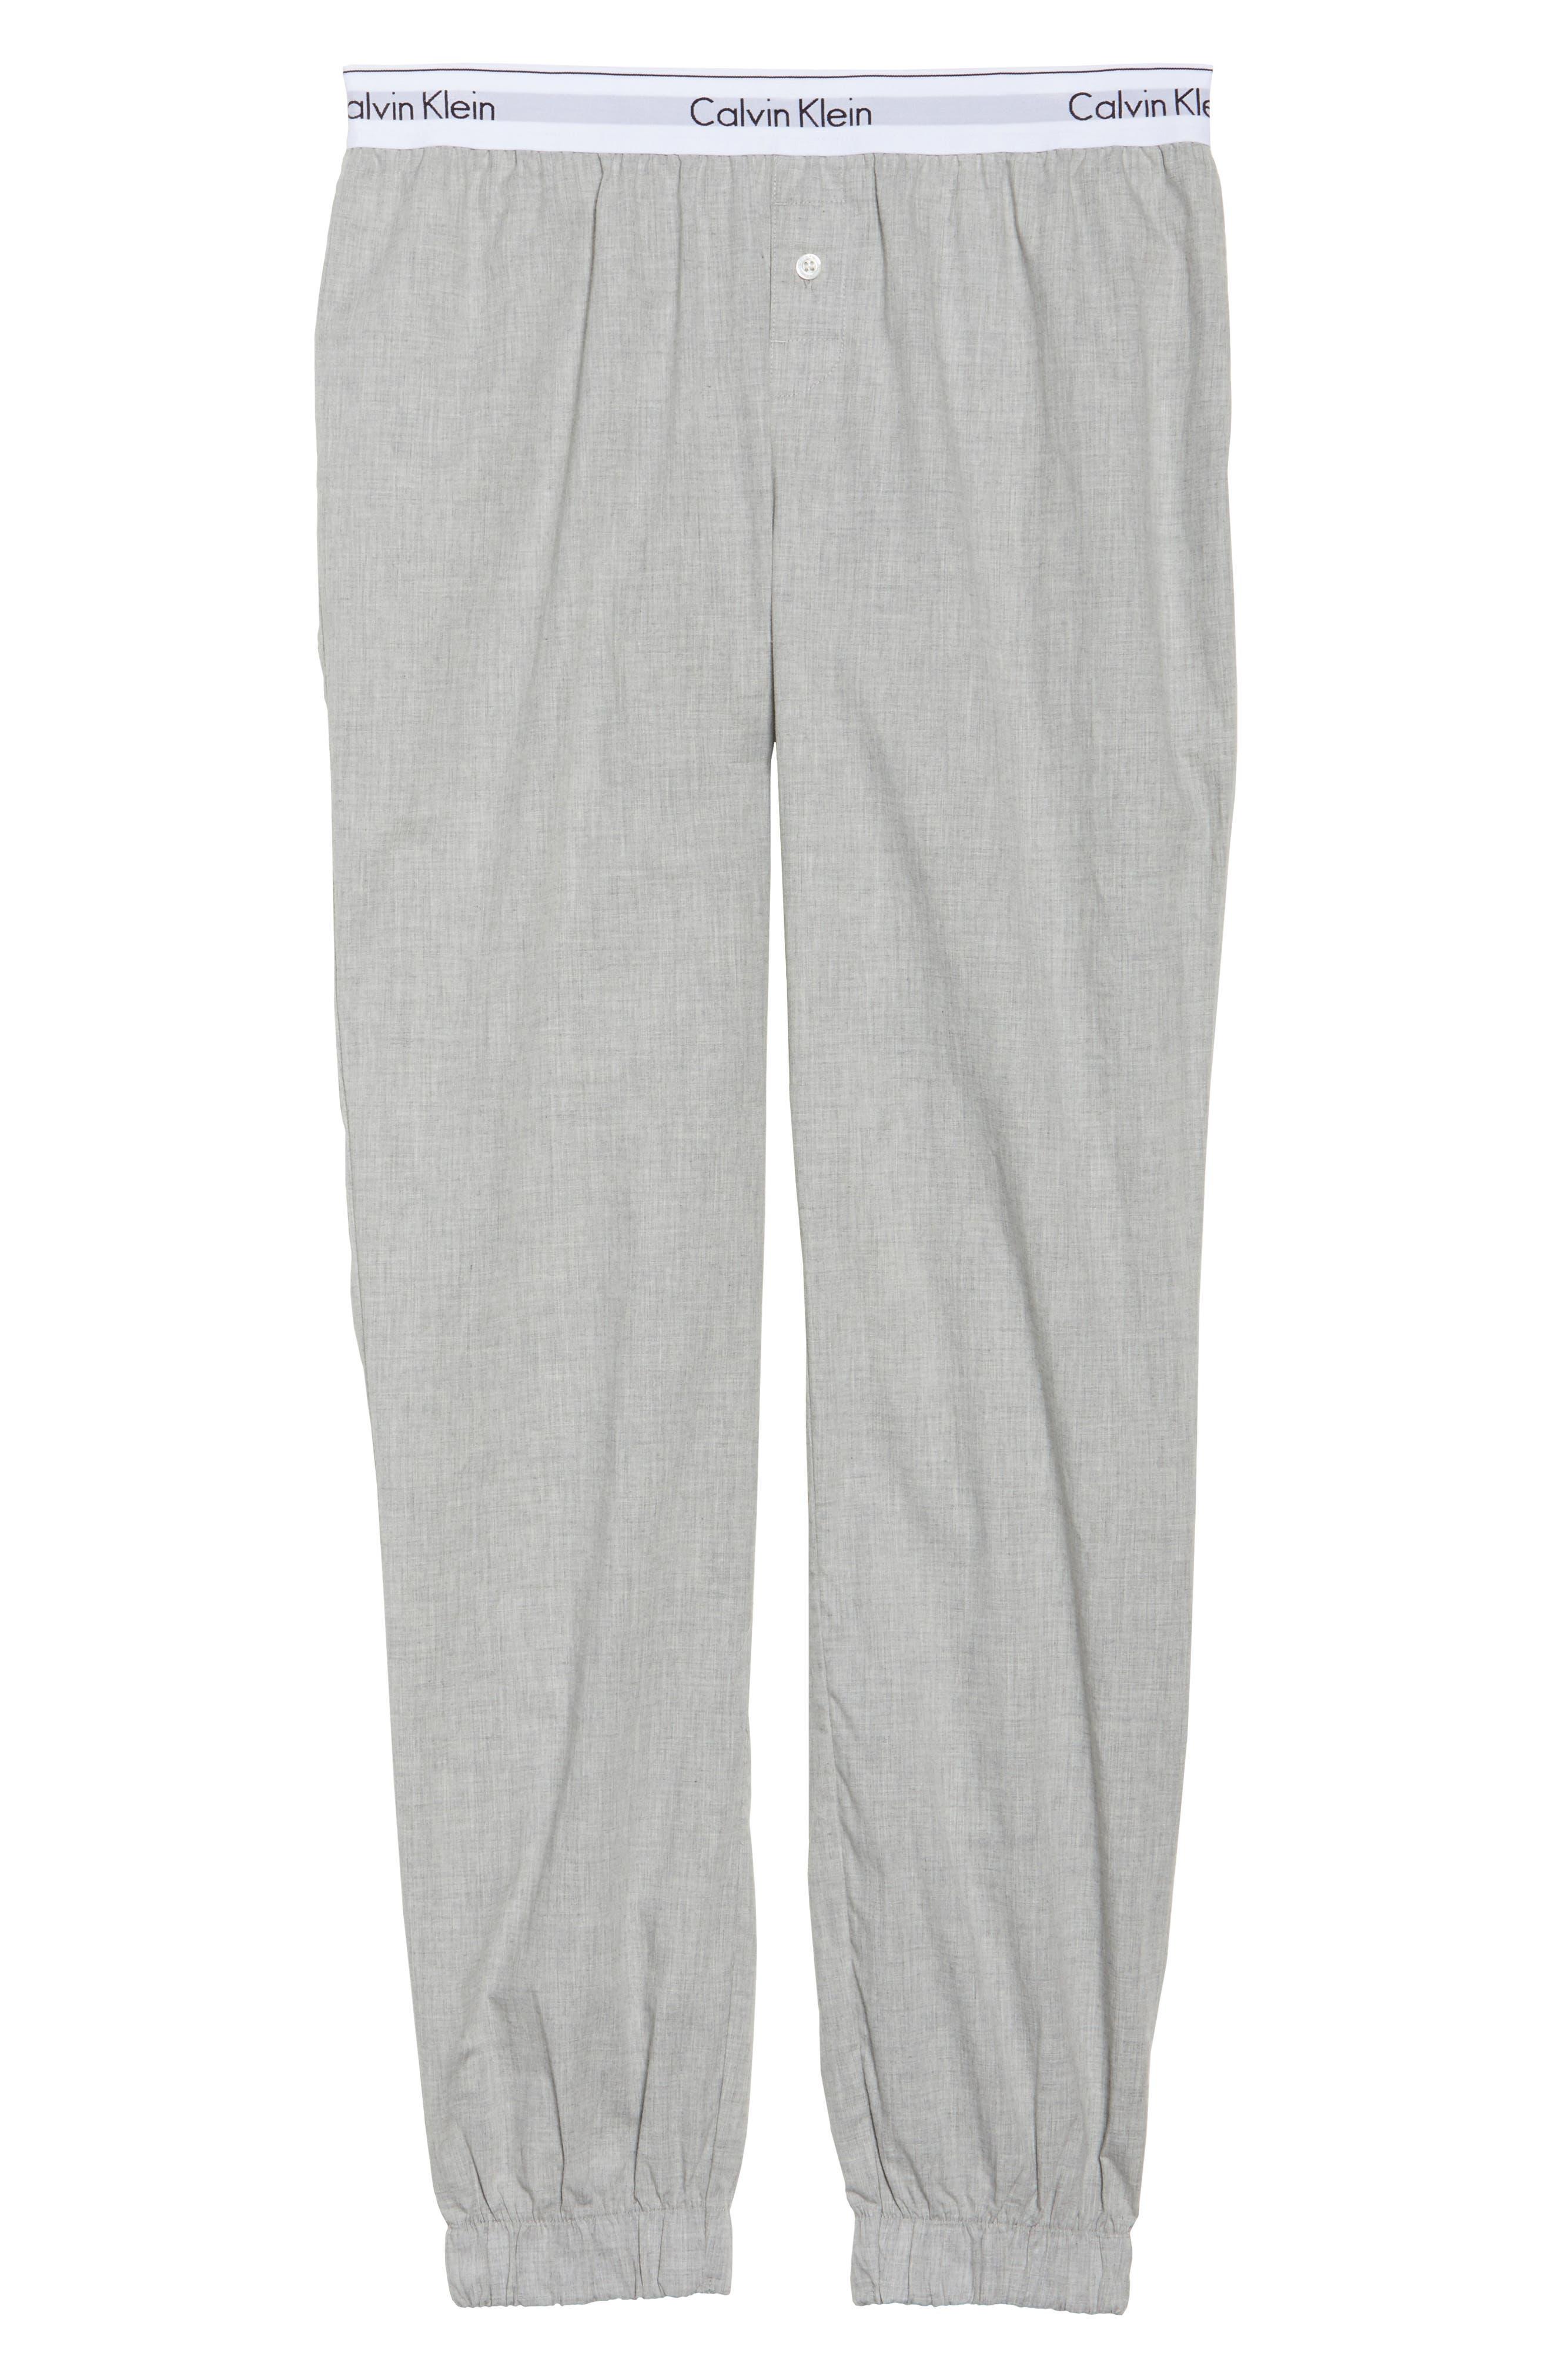 Lounge Jogger Pants,                             Alternate thumbnail 4, color,                             Grey Heather